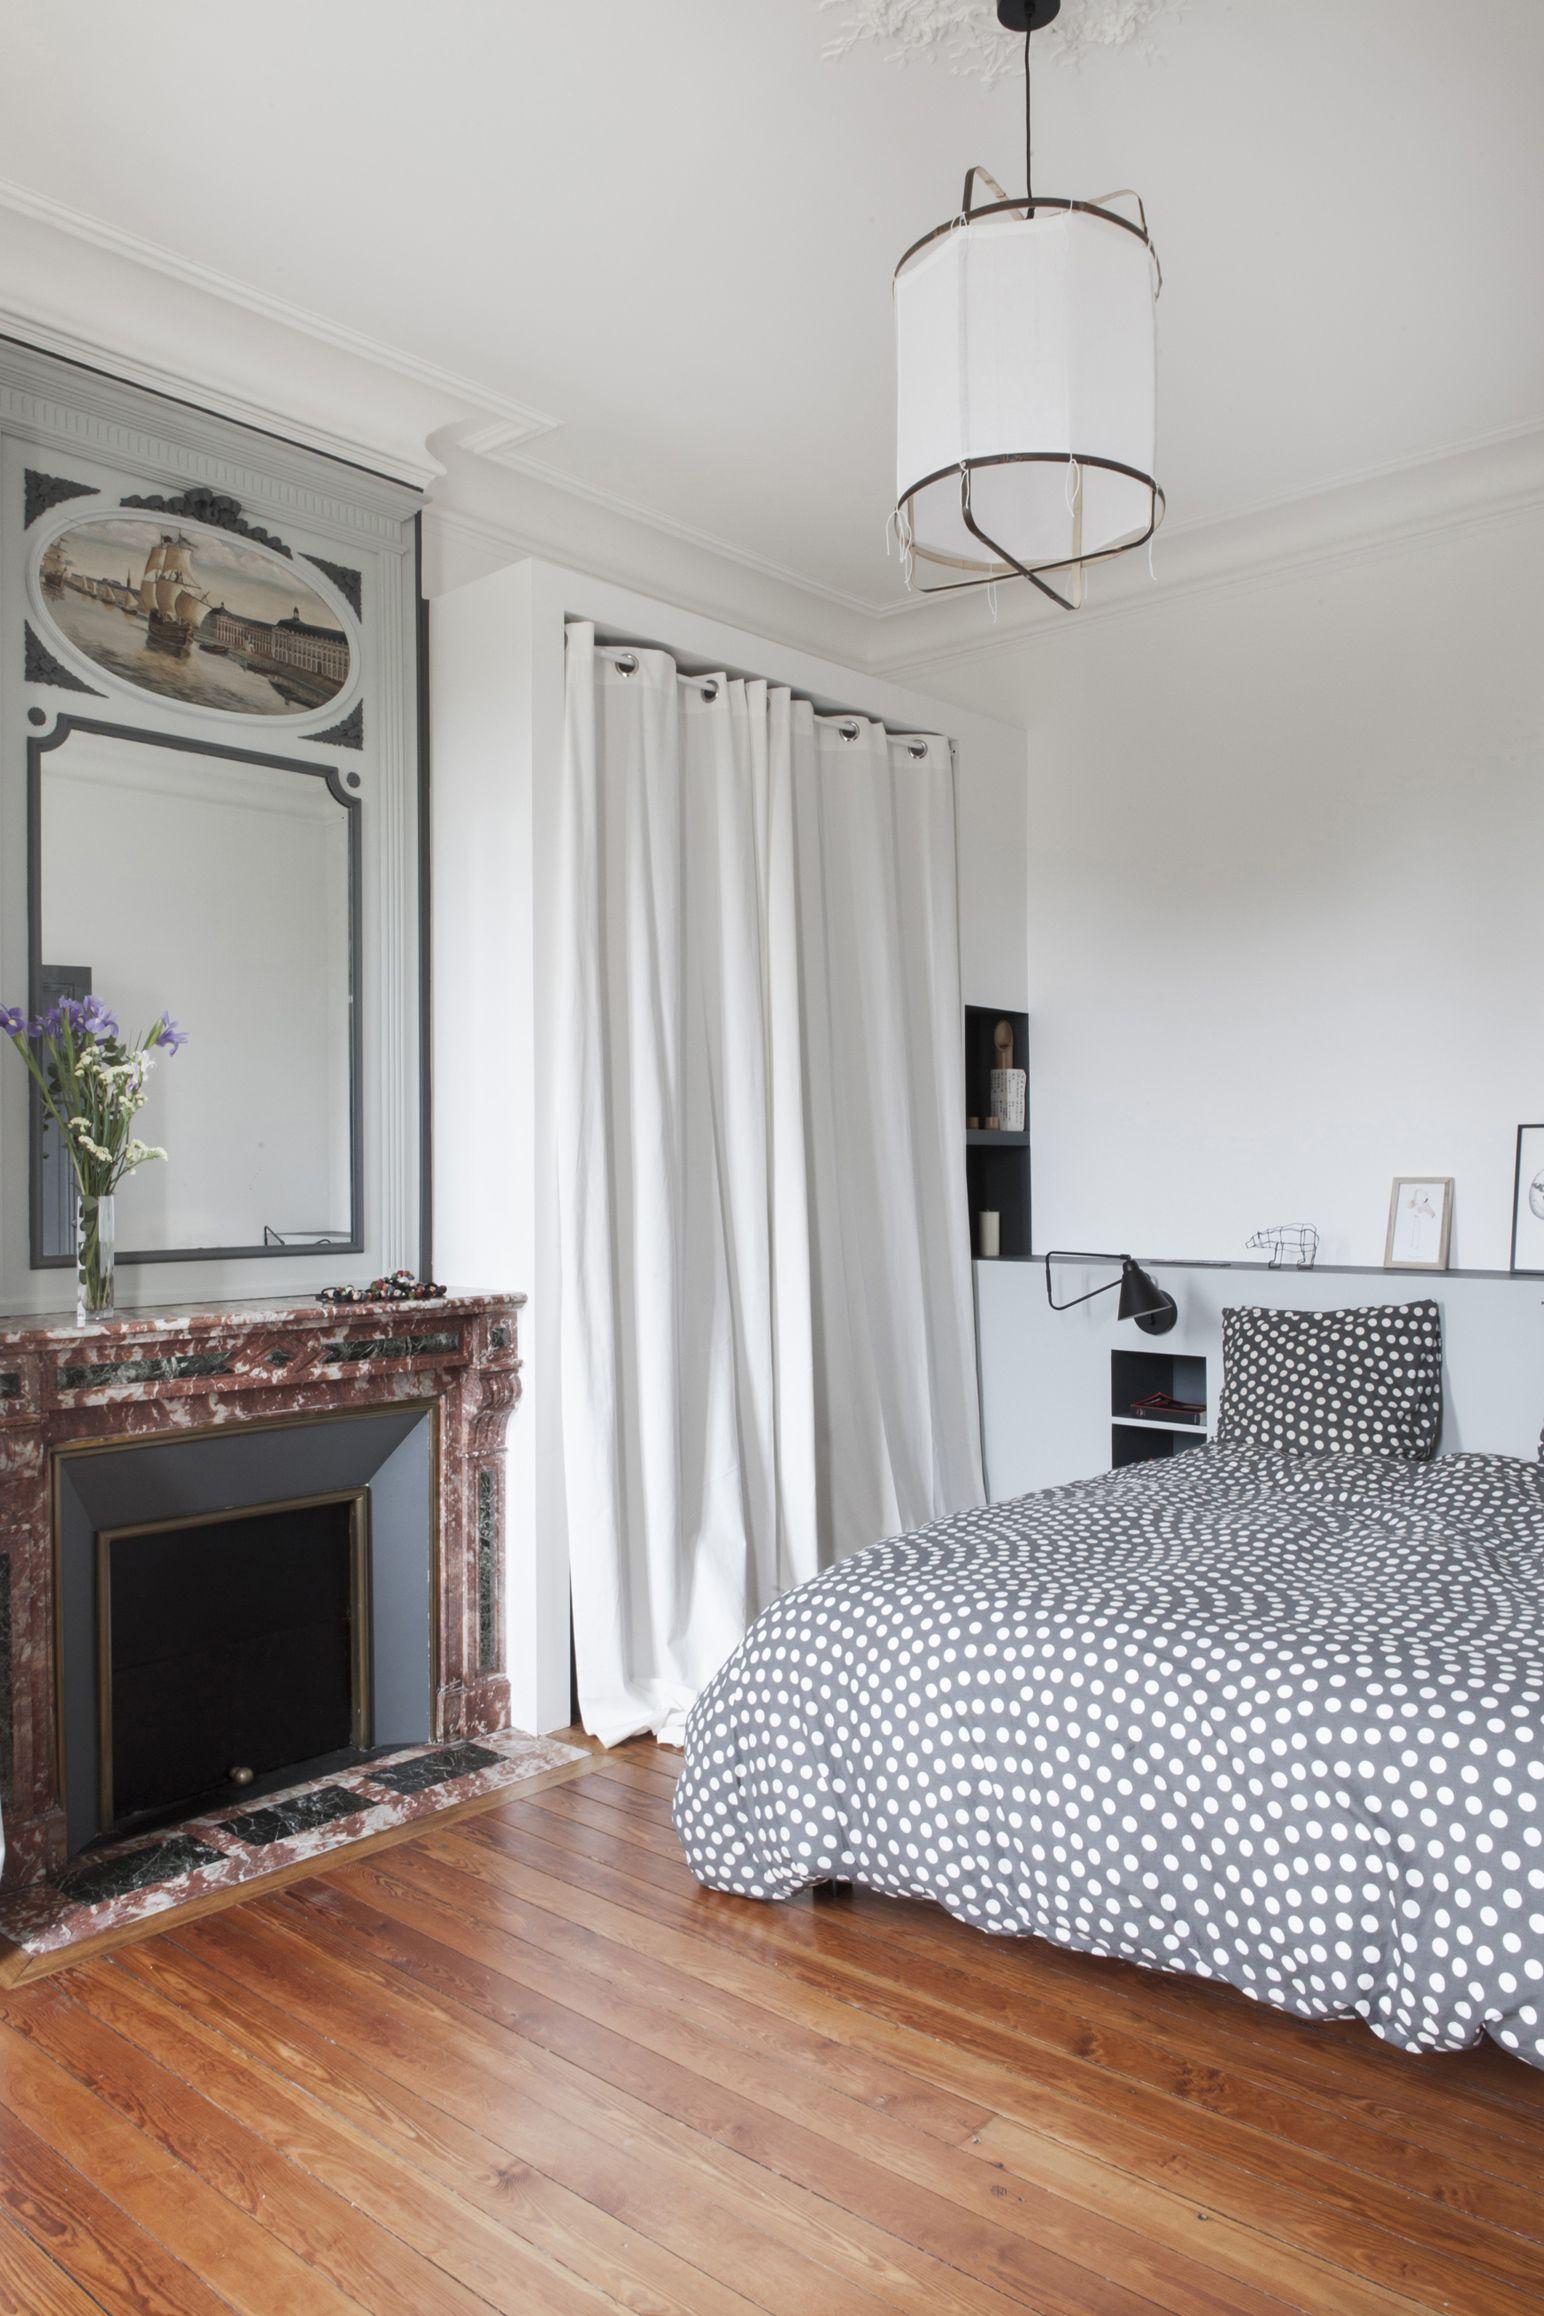 100 Remarquable Conseils Renover Chambre A Coucher Maison